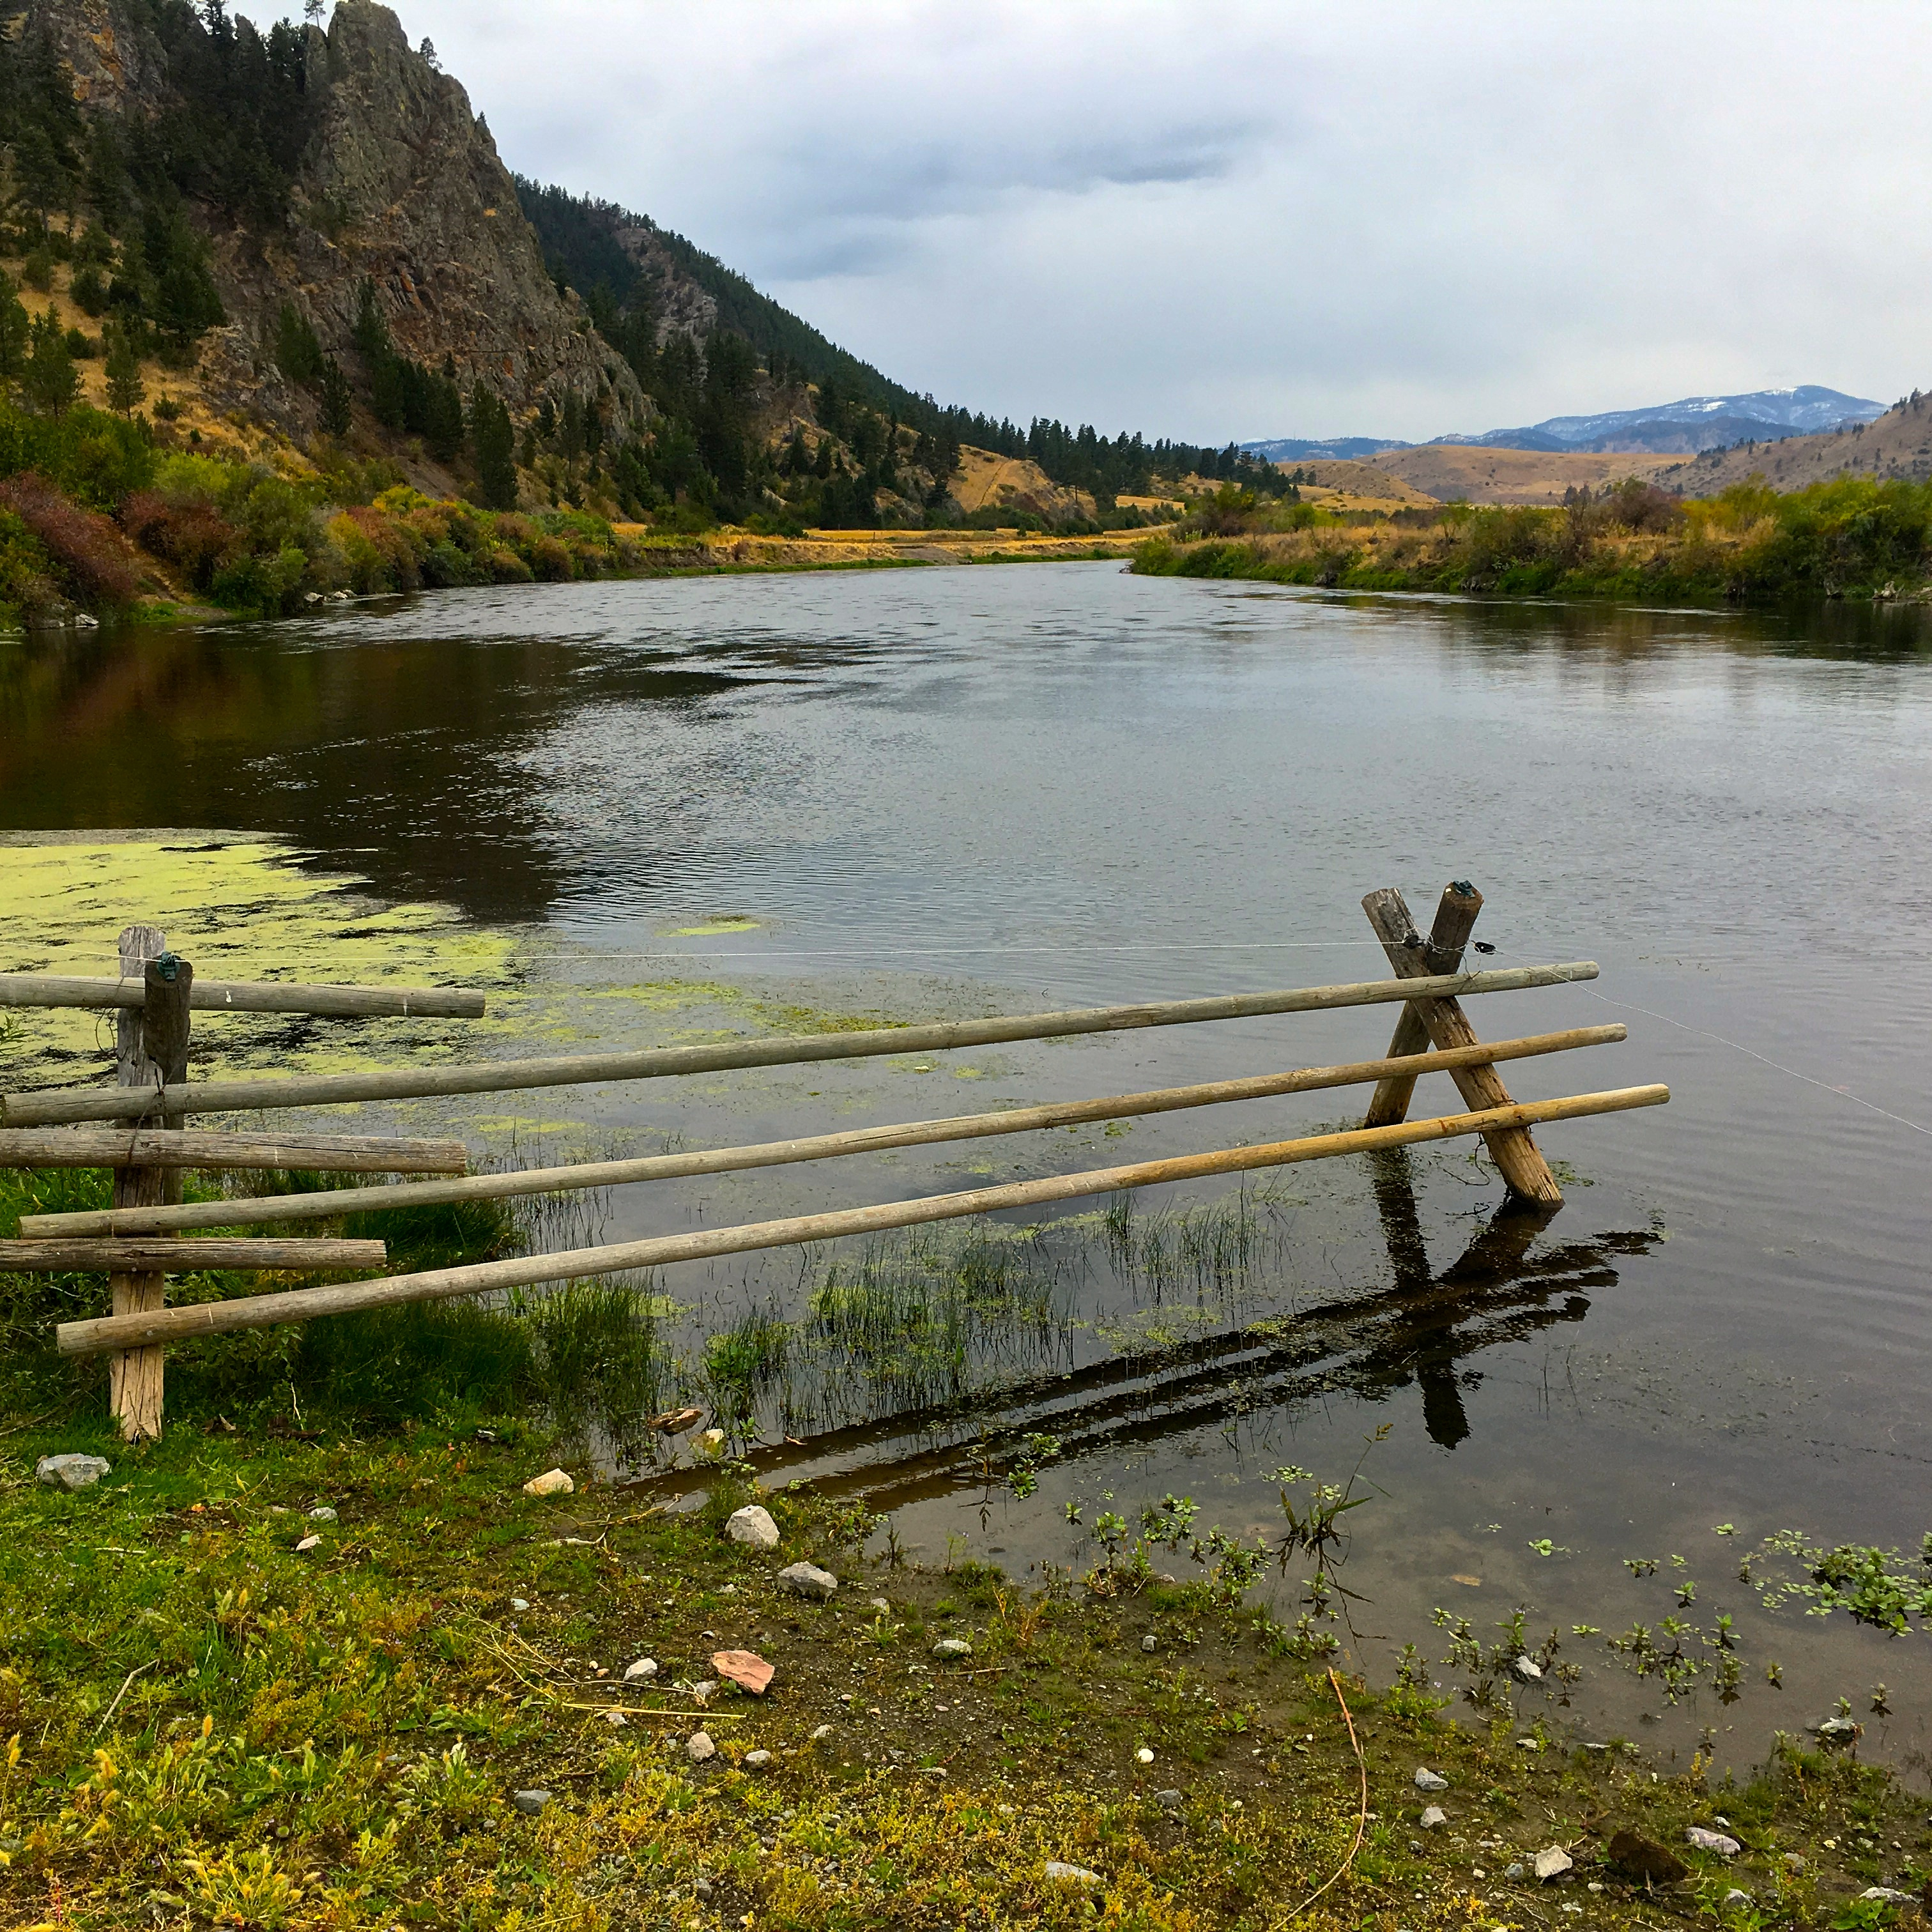 Hump Day Fishing Report Montana's Missouri River